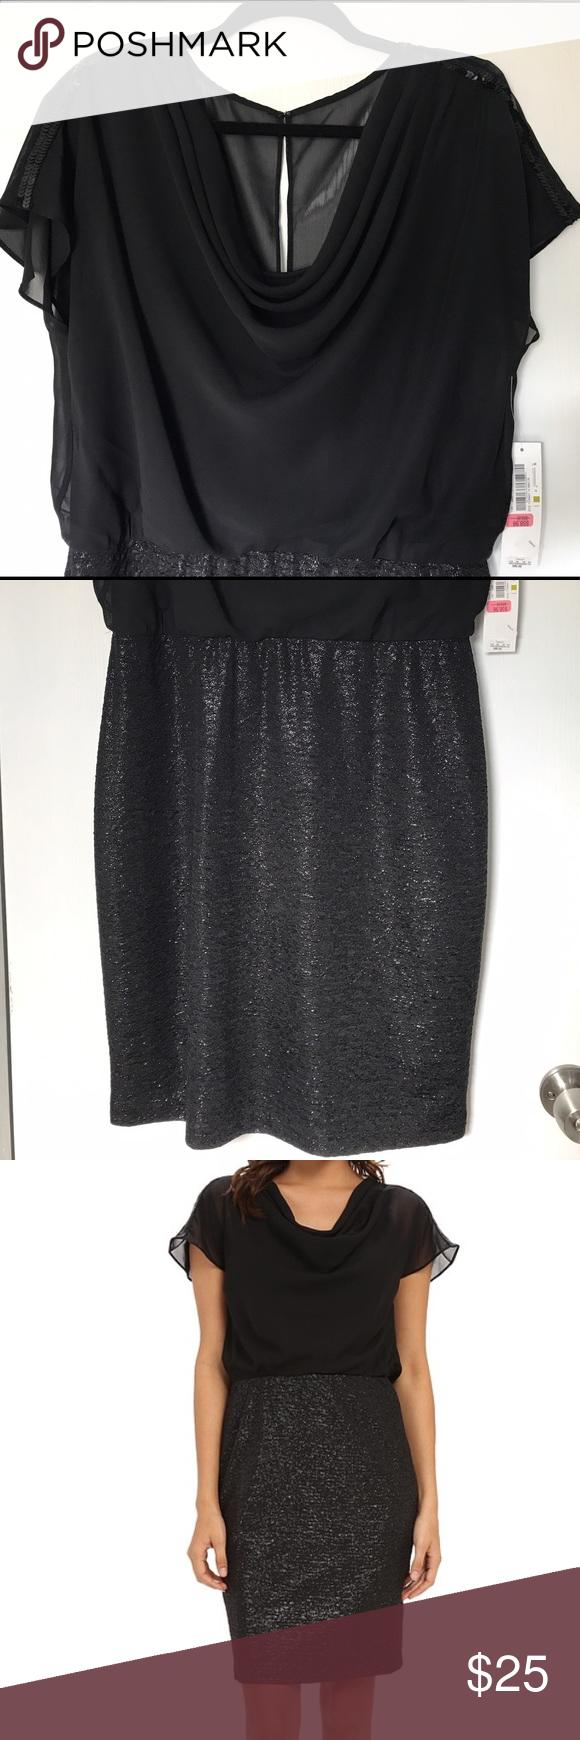 London Times Black Dress W Sheer Top For Coverage London Times Black Dress Sheer Top Sparkly Skirt [ 1740 x 580 Pixel ]